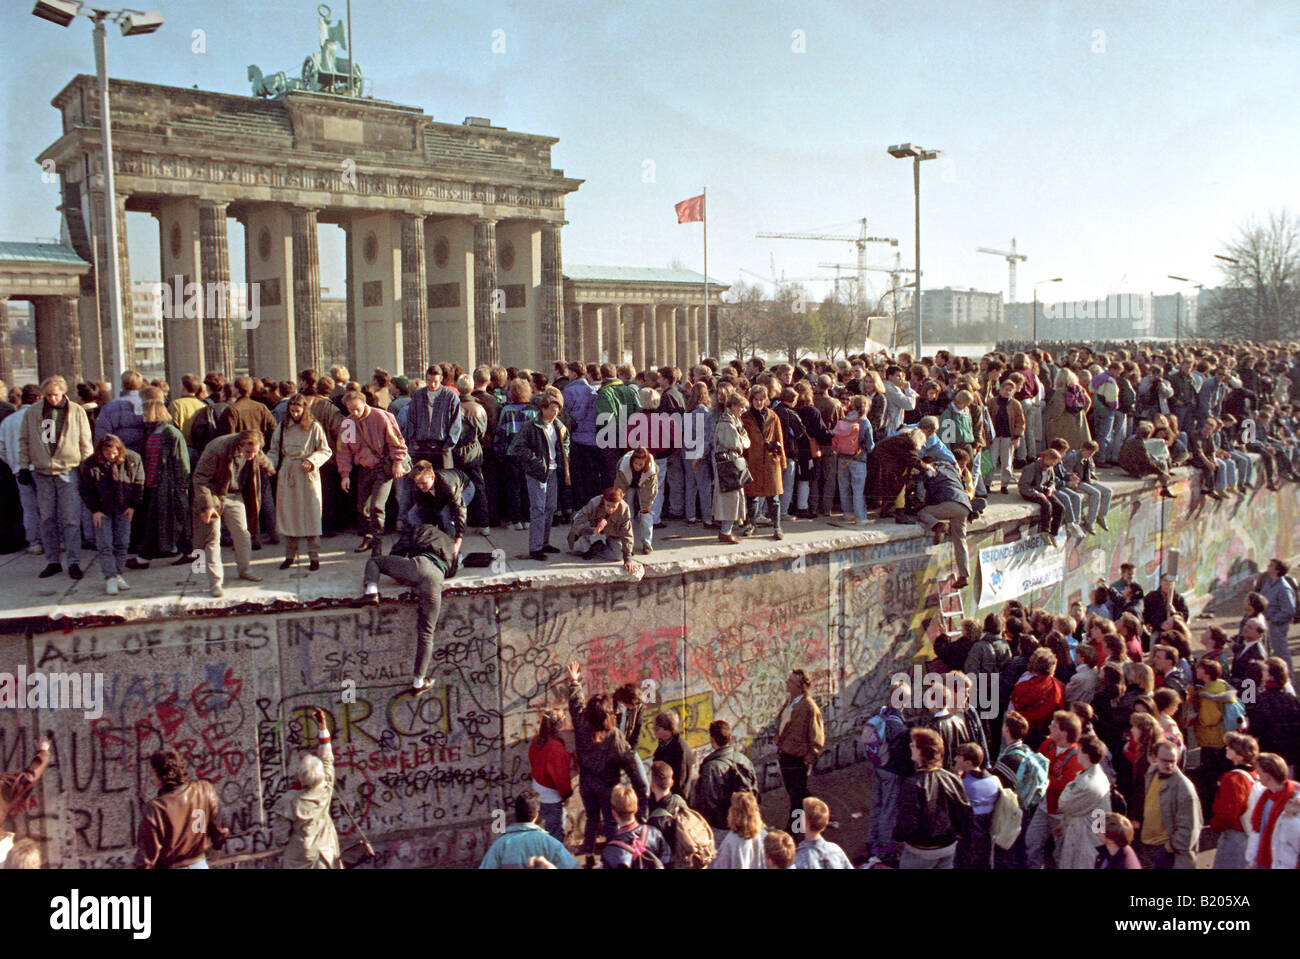 1989 revolution fall of the soviet union essay